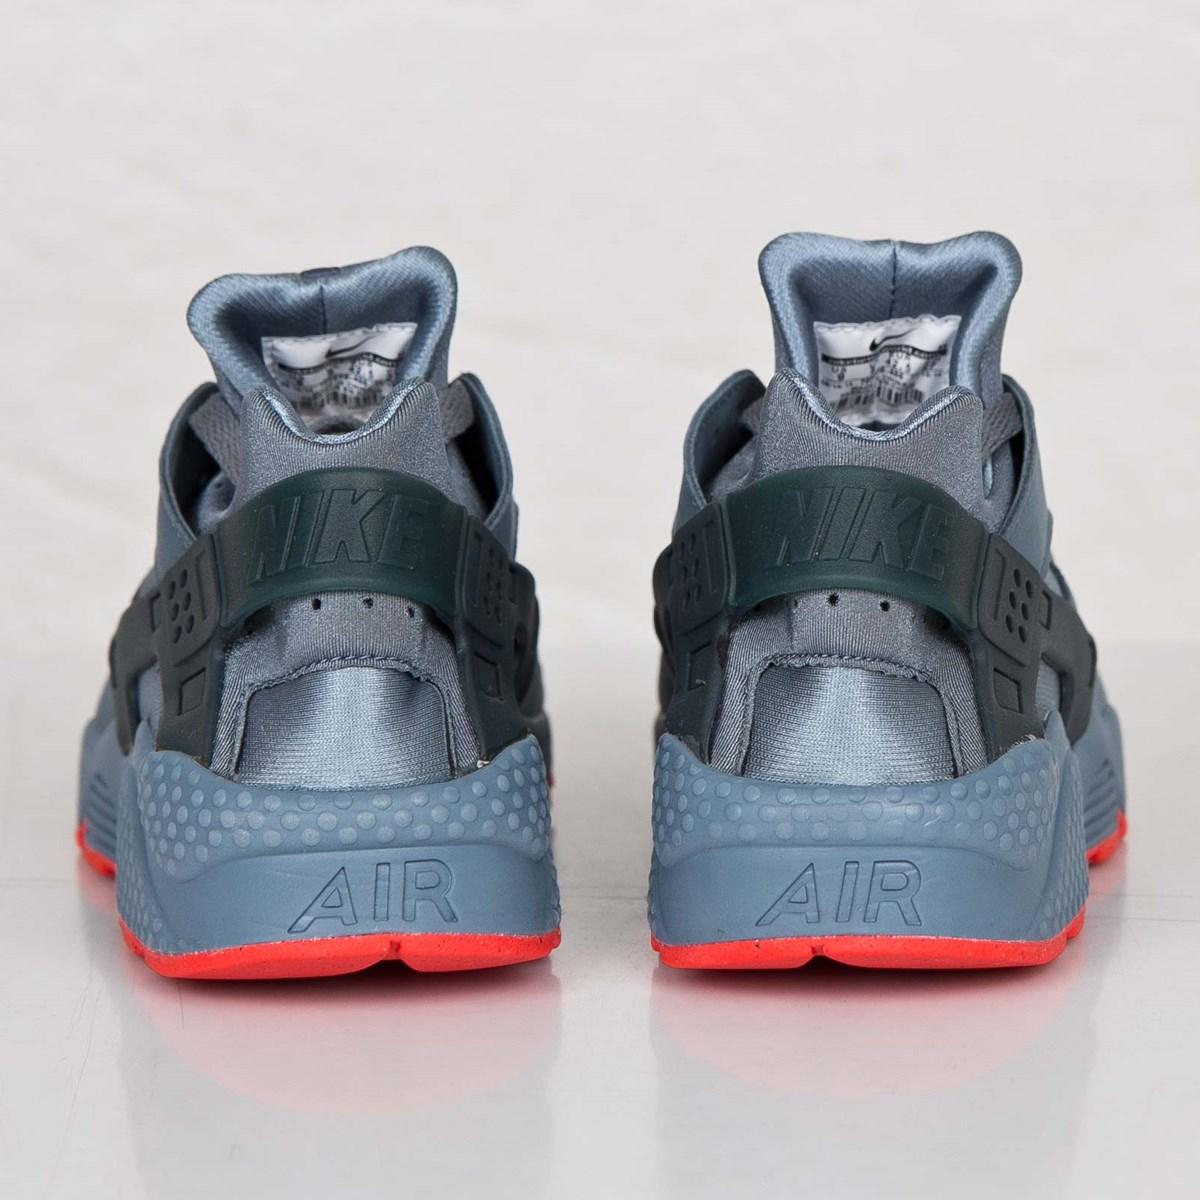 eb8f7340046102 Nike Air Huarache Run FB - 705070-400 - Sneakersnstuff